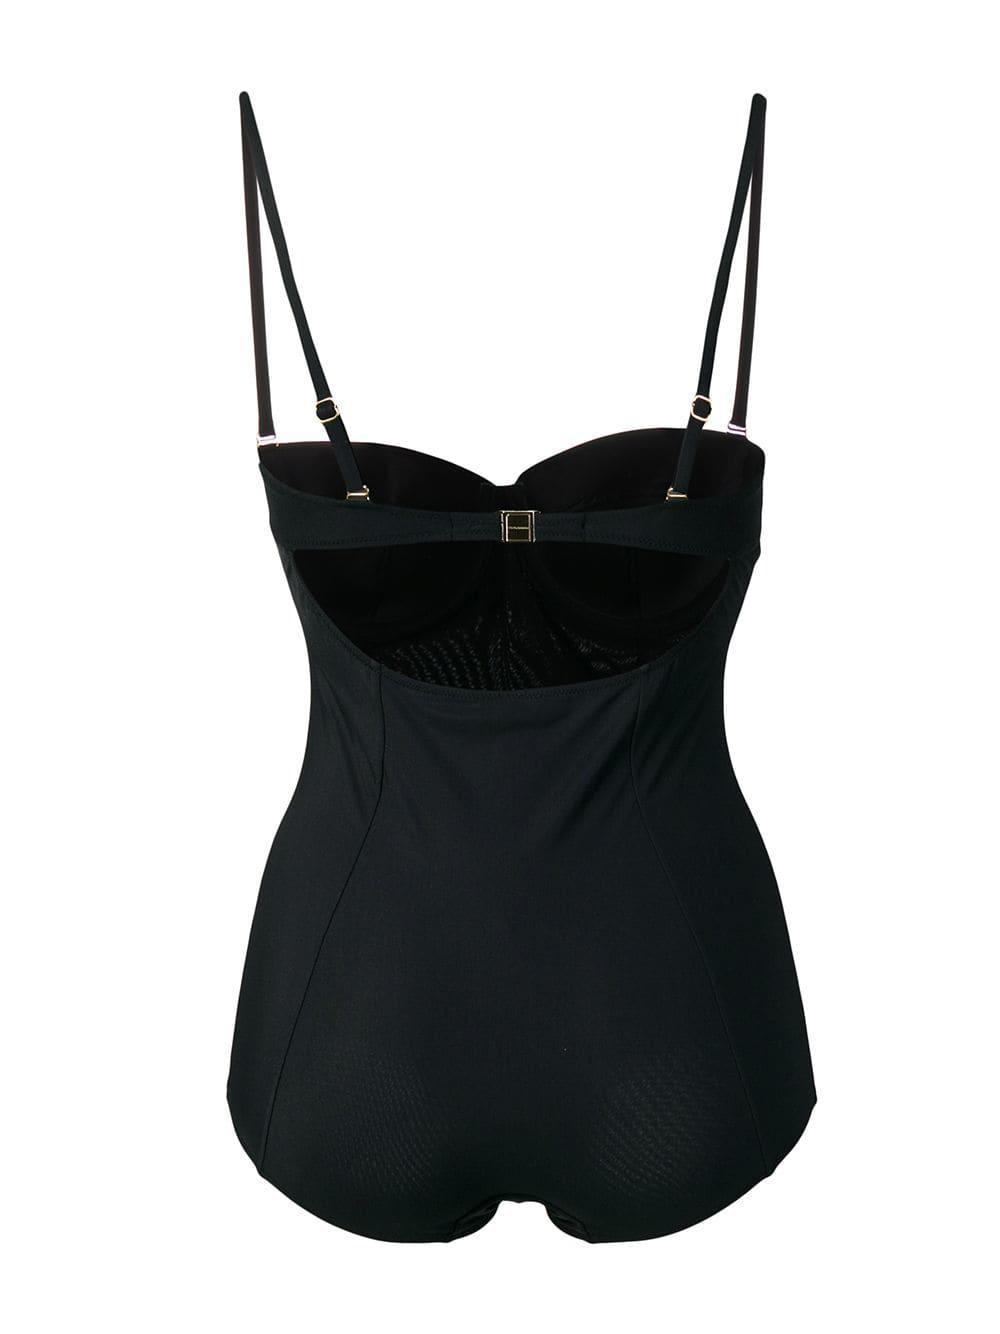 7cb4a80844 Dolce   Gabbana - Black Balconette Swimsuit - Lyst. View fullscreen